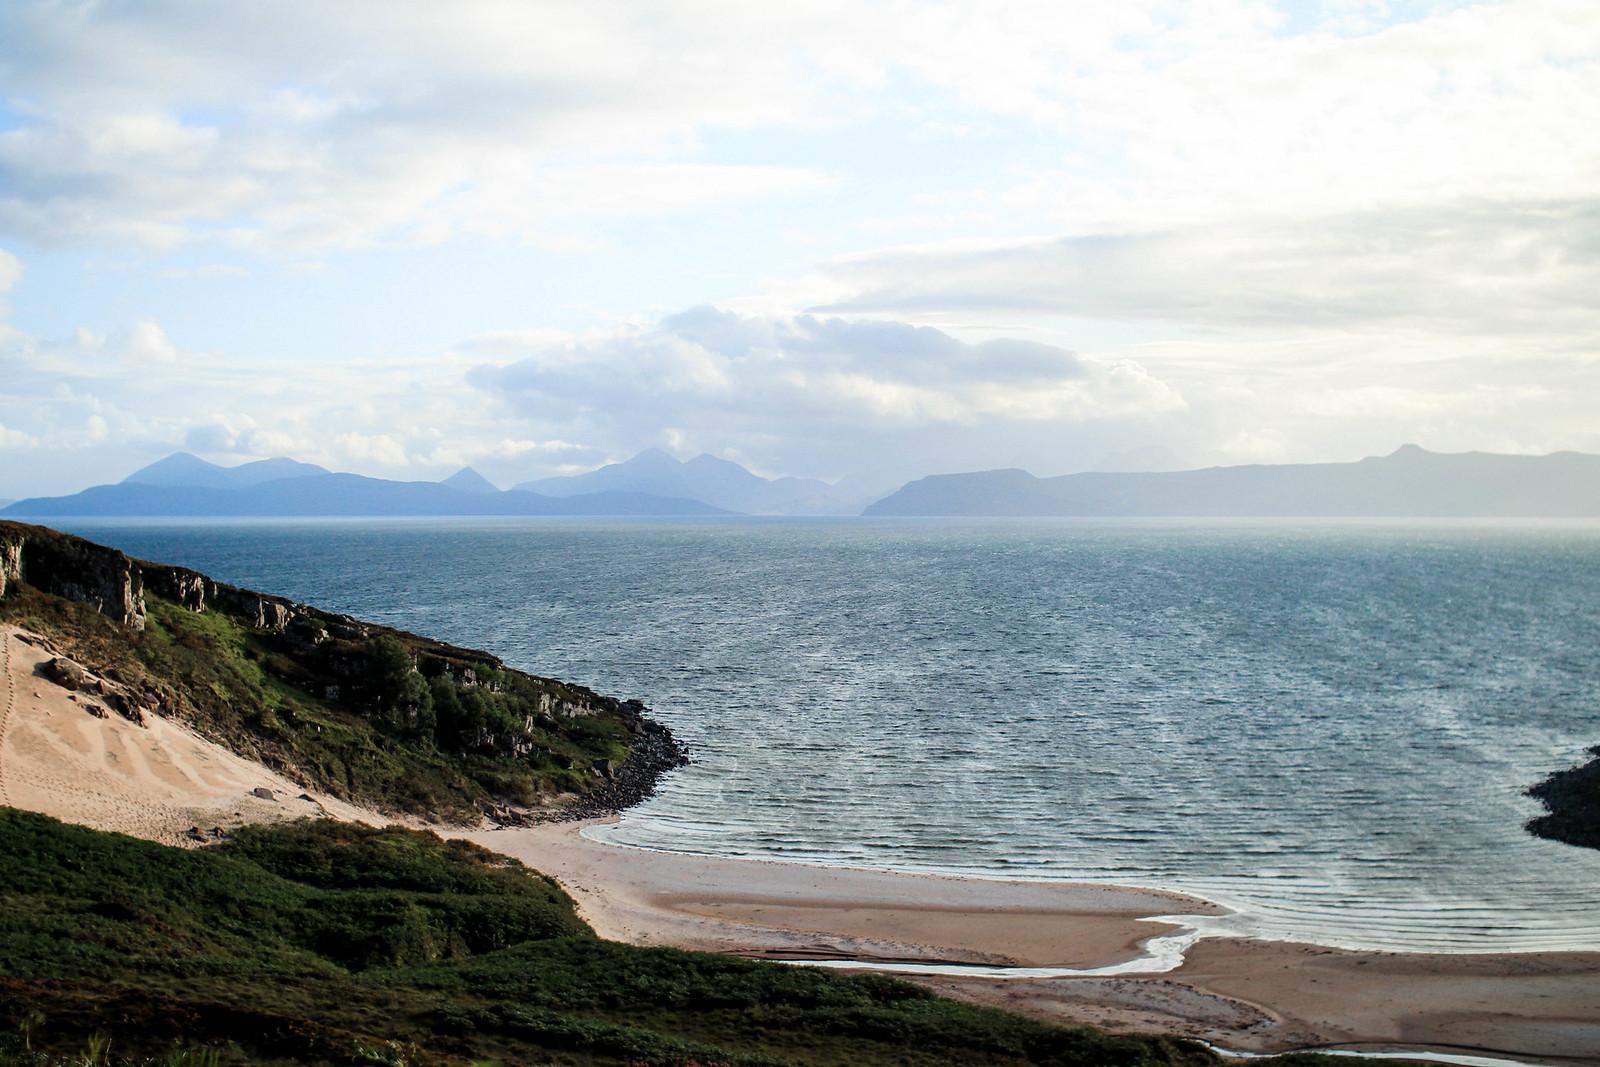 Applecross Peninsula Scotland NC500 Route travel blogger UK